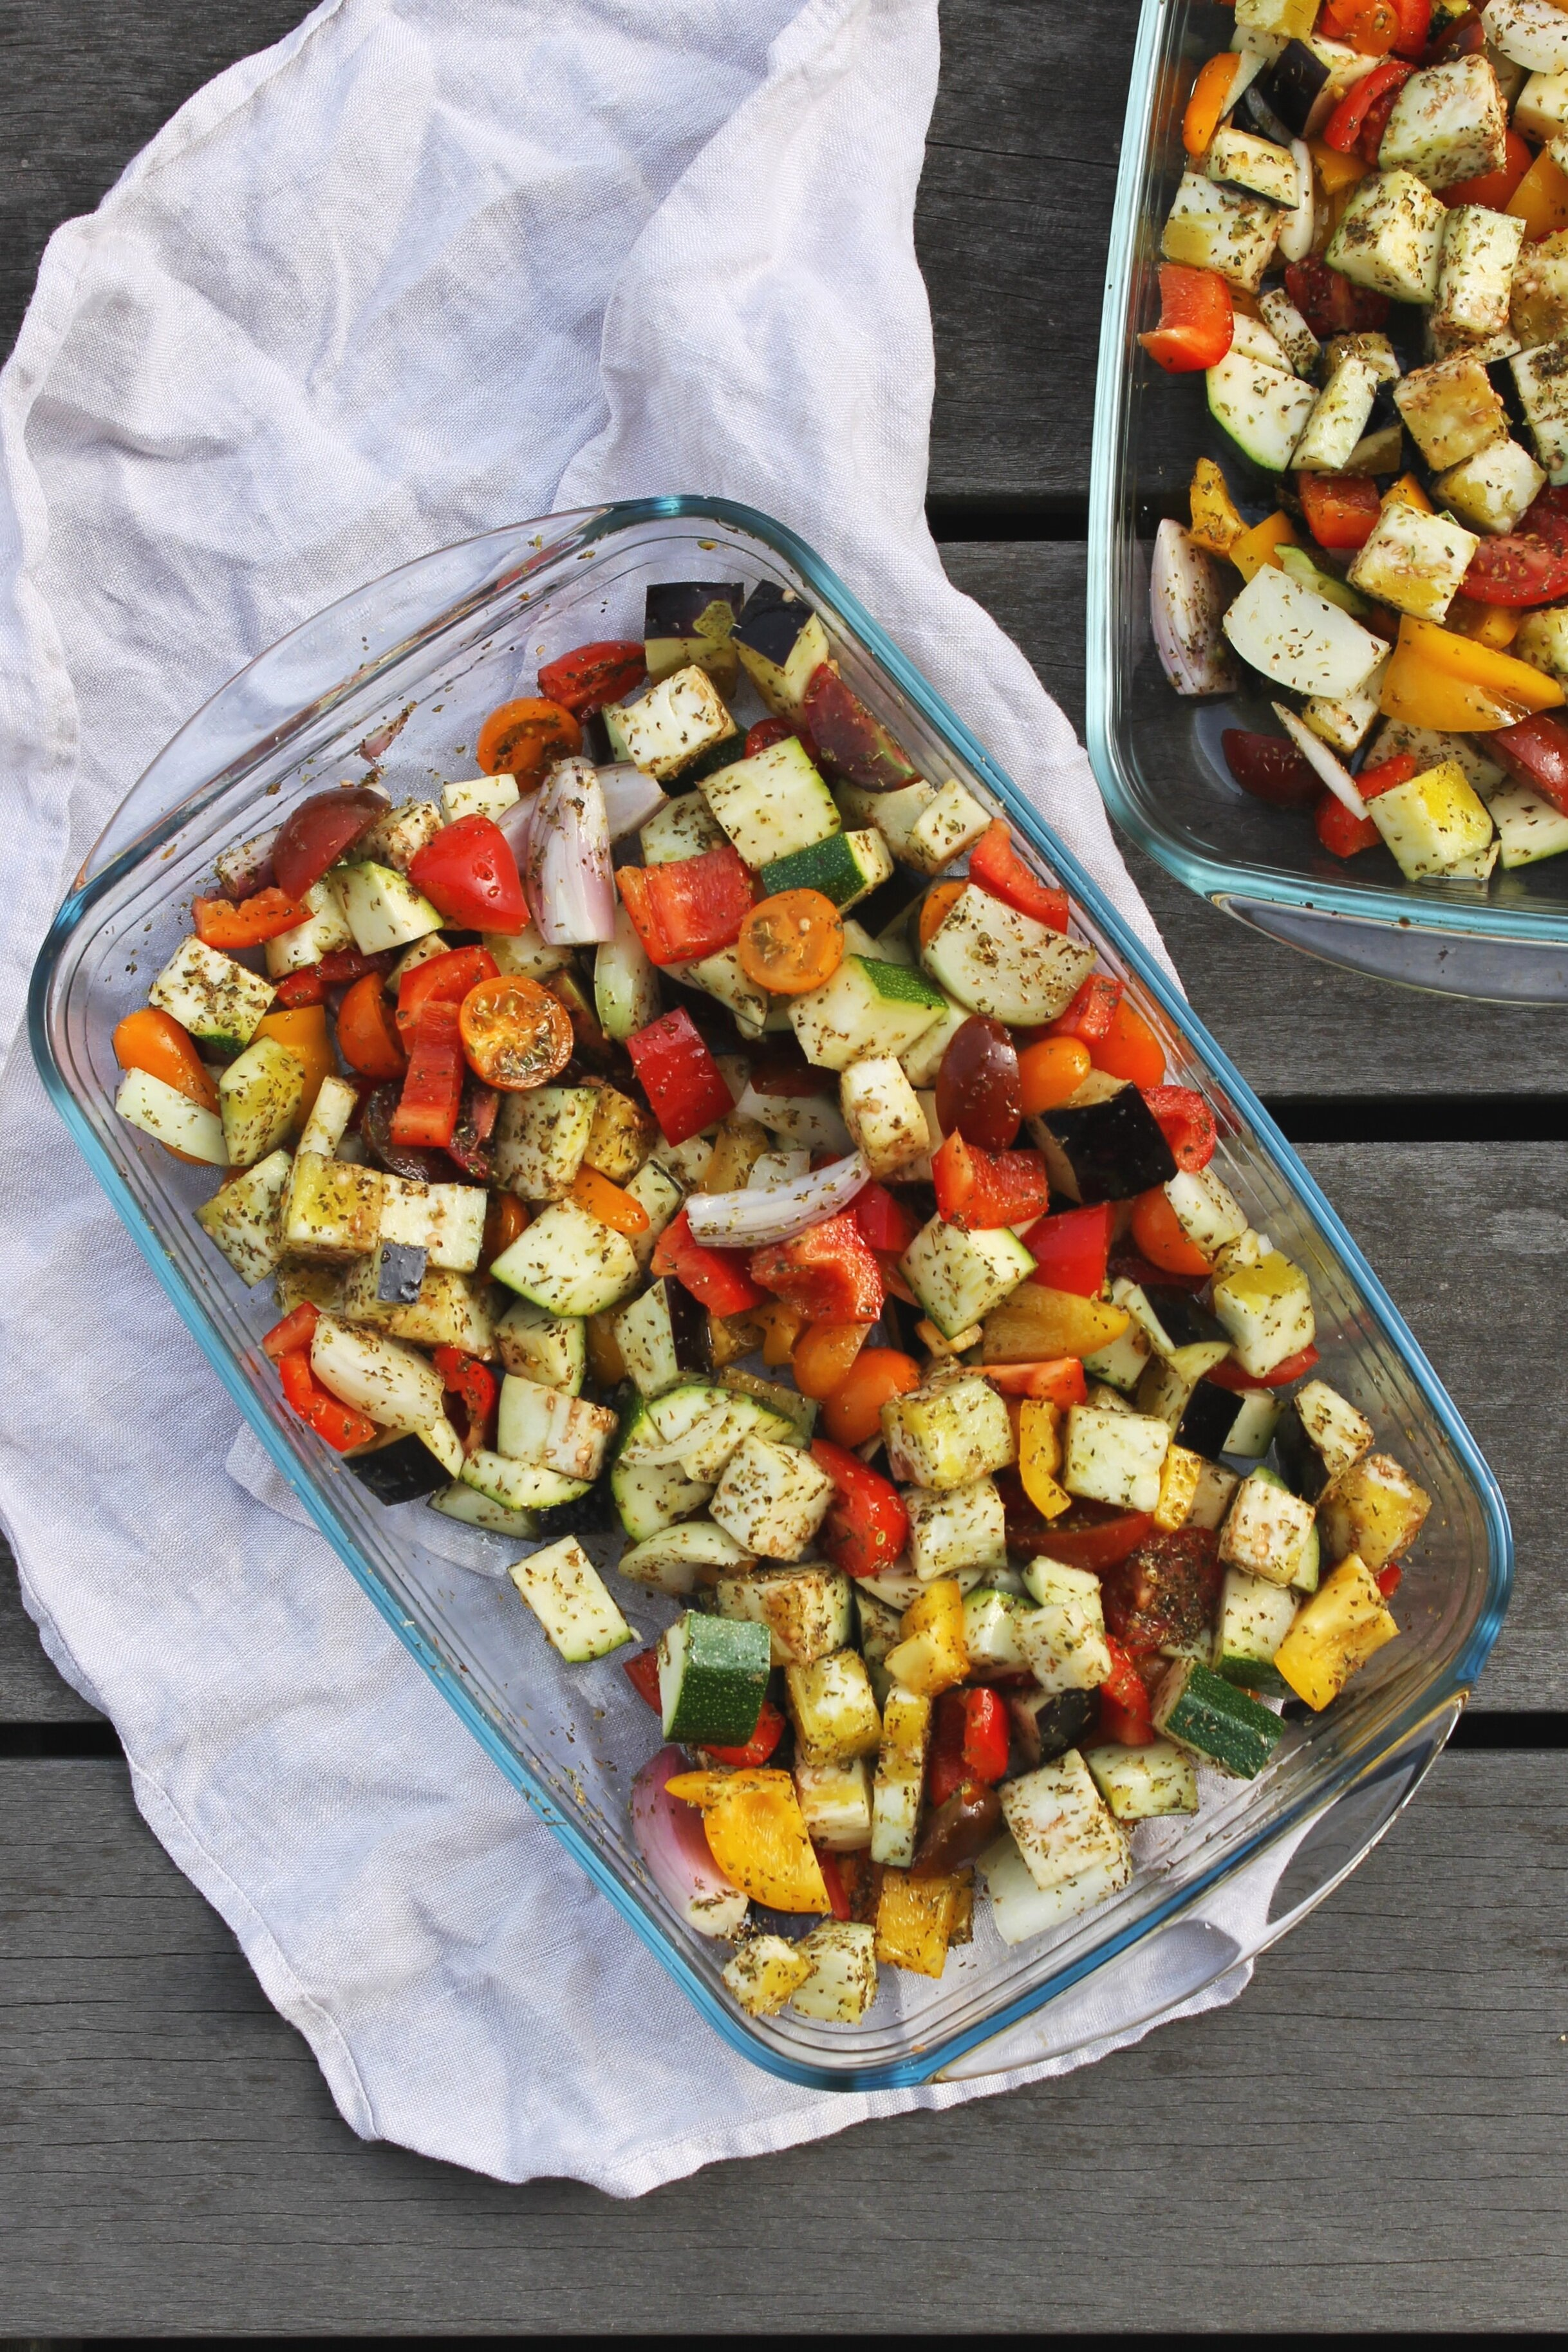 Roasted vegetable and quinoa salad | Beloved Kitchen